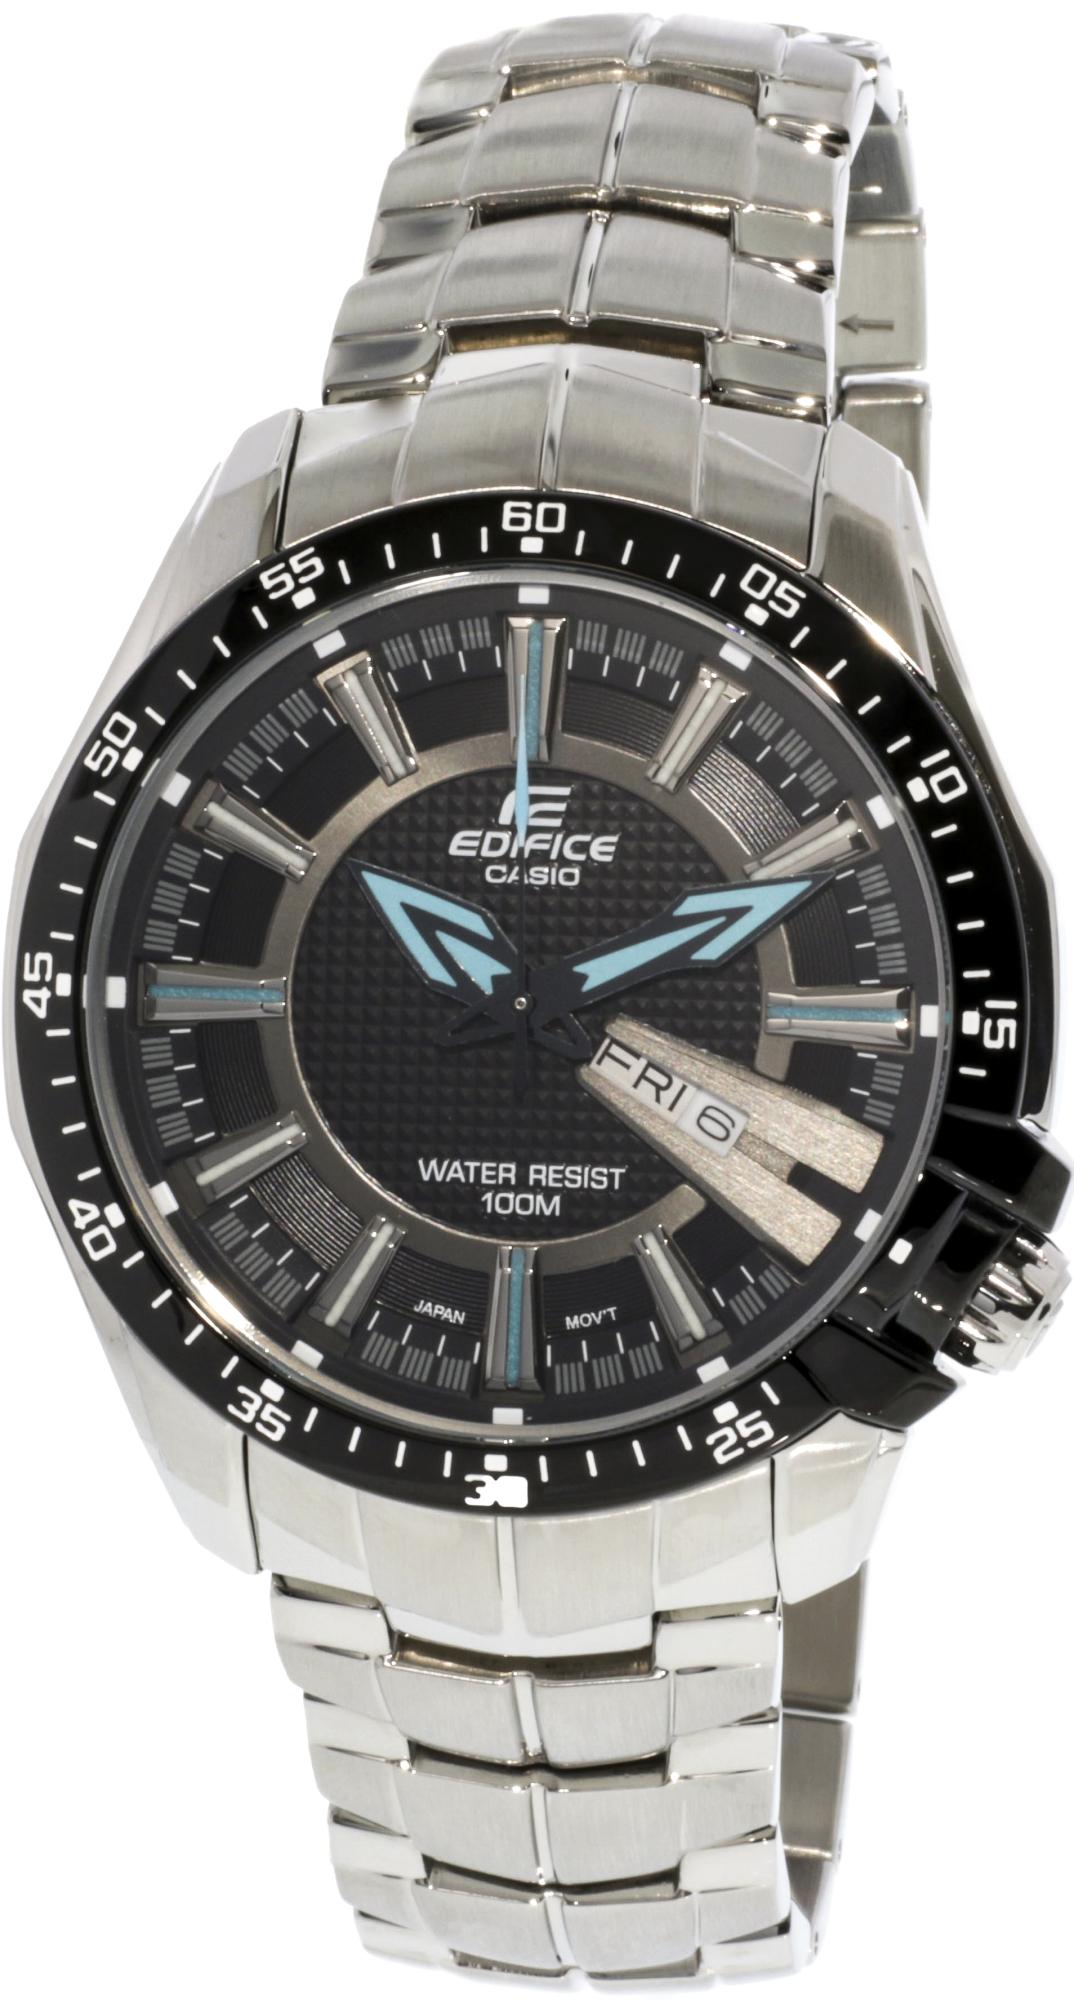 Casio Men's Edifice EF130D-1A2V Black Stainless-Steel Quartz Fashion Watch